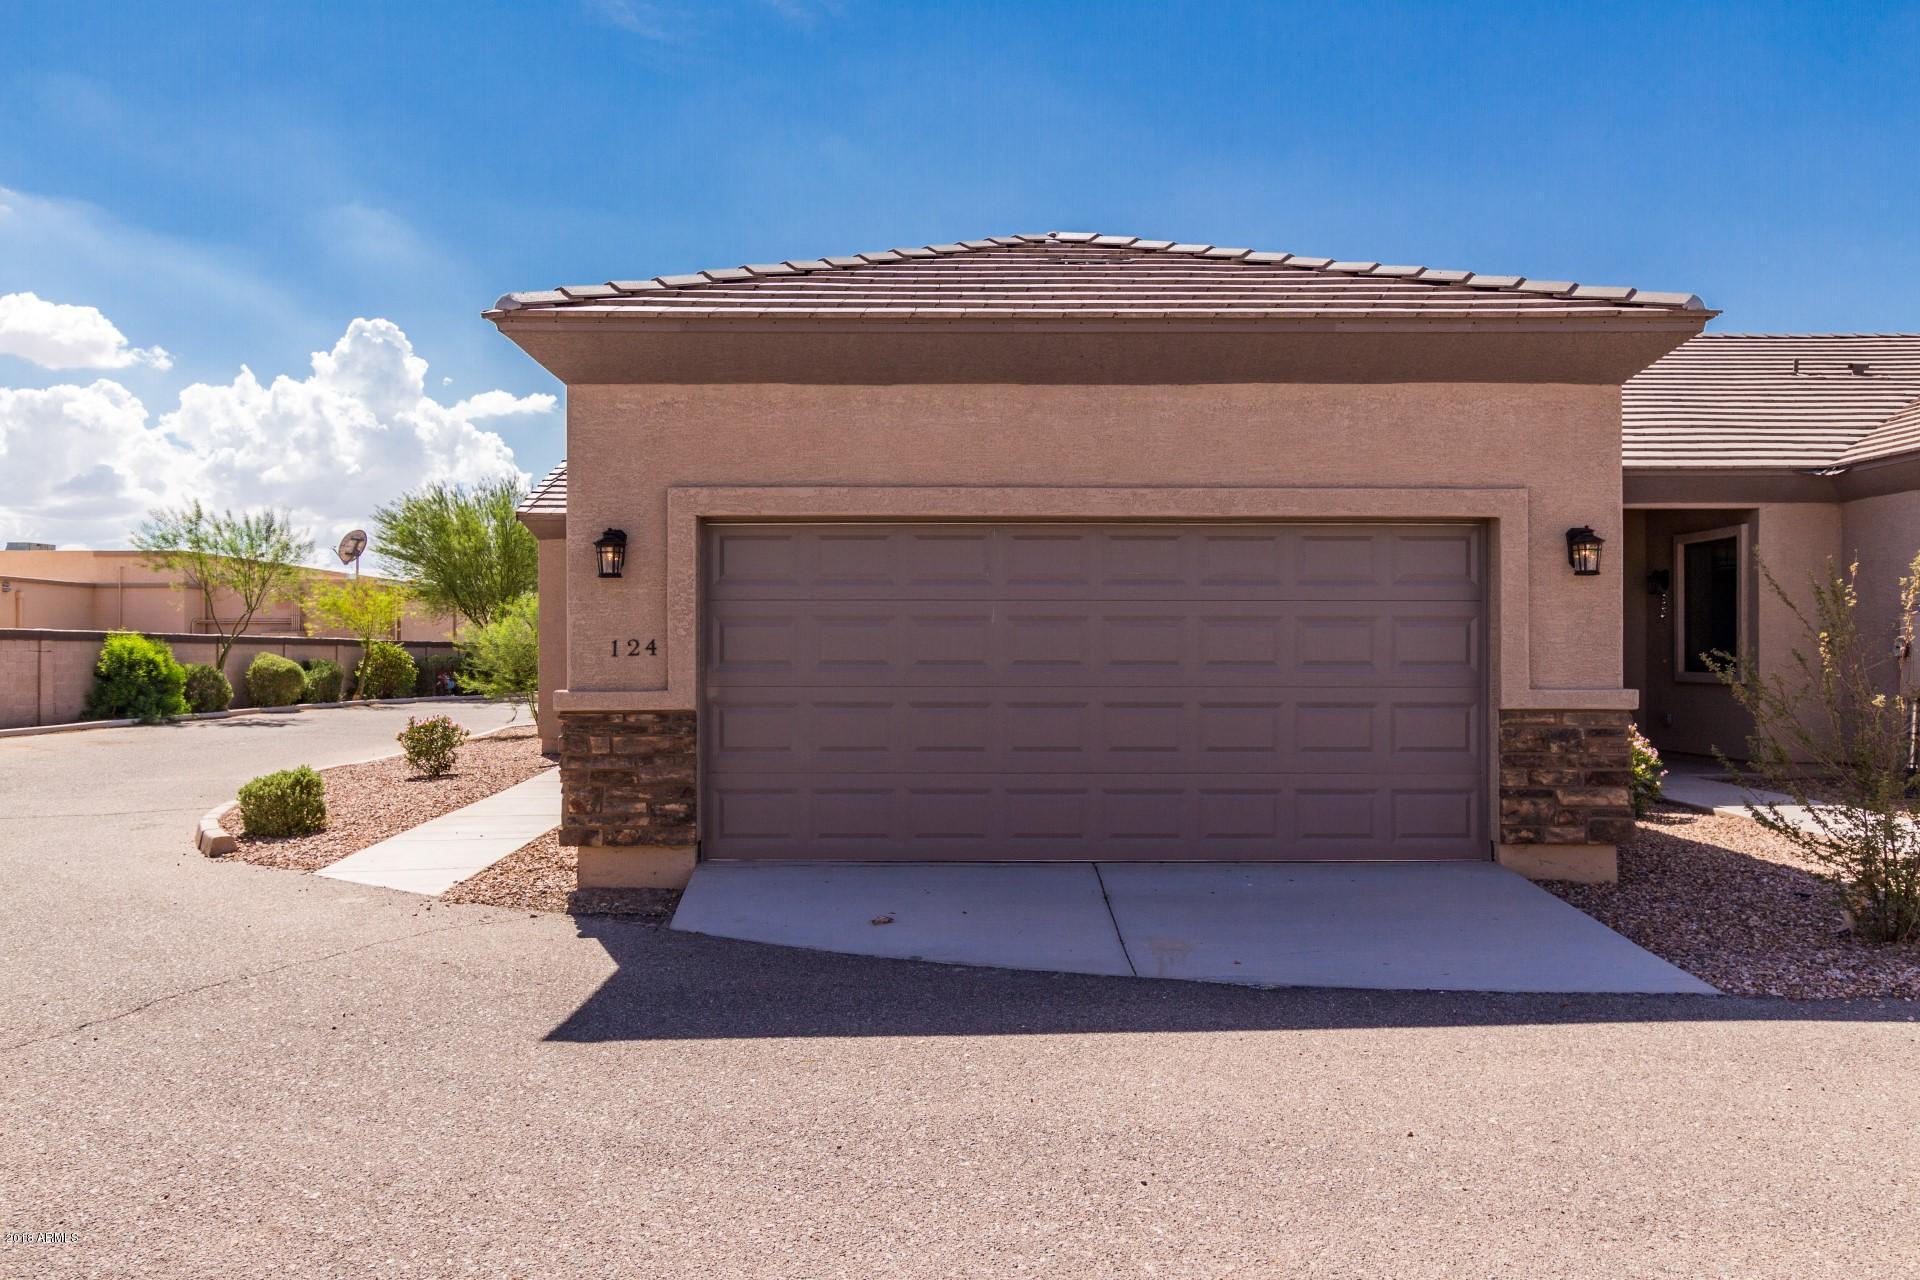 Photo for 846 N Pueblo Drive, Unit 124, Casa Grande, AZ 85122 (MLS # 5862166)